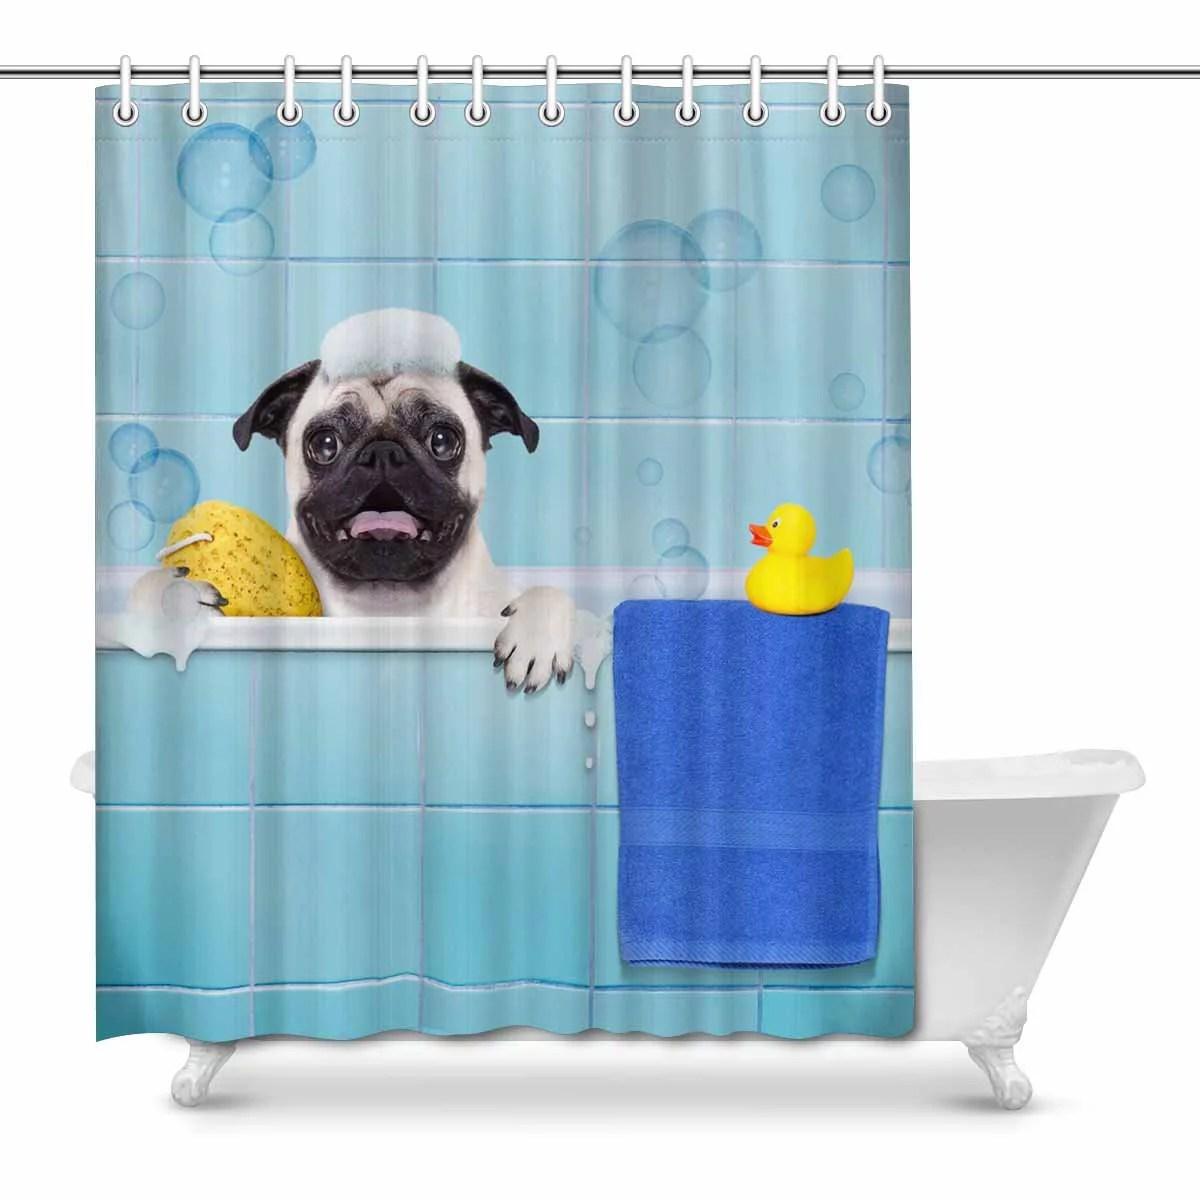 mkhert funny pug dog with yellow rubber duck in bathtub waterproof shower curtain decor fabric bathroom set 66x72 inch